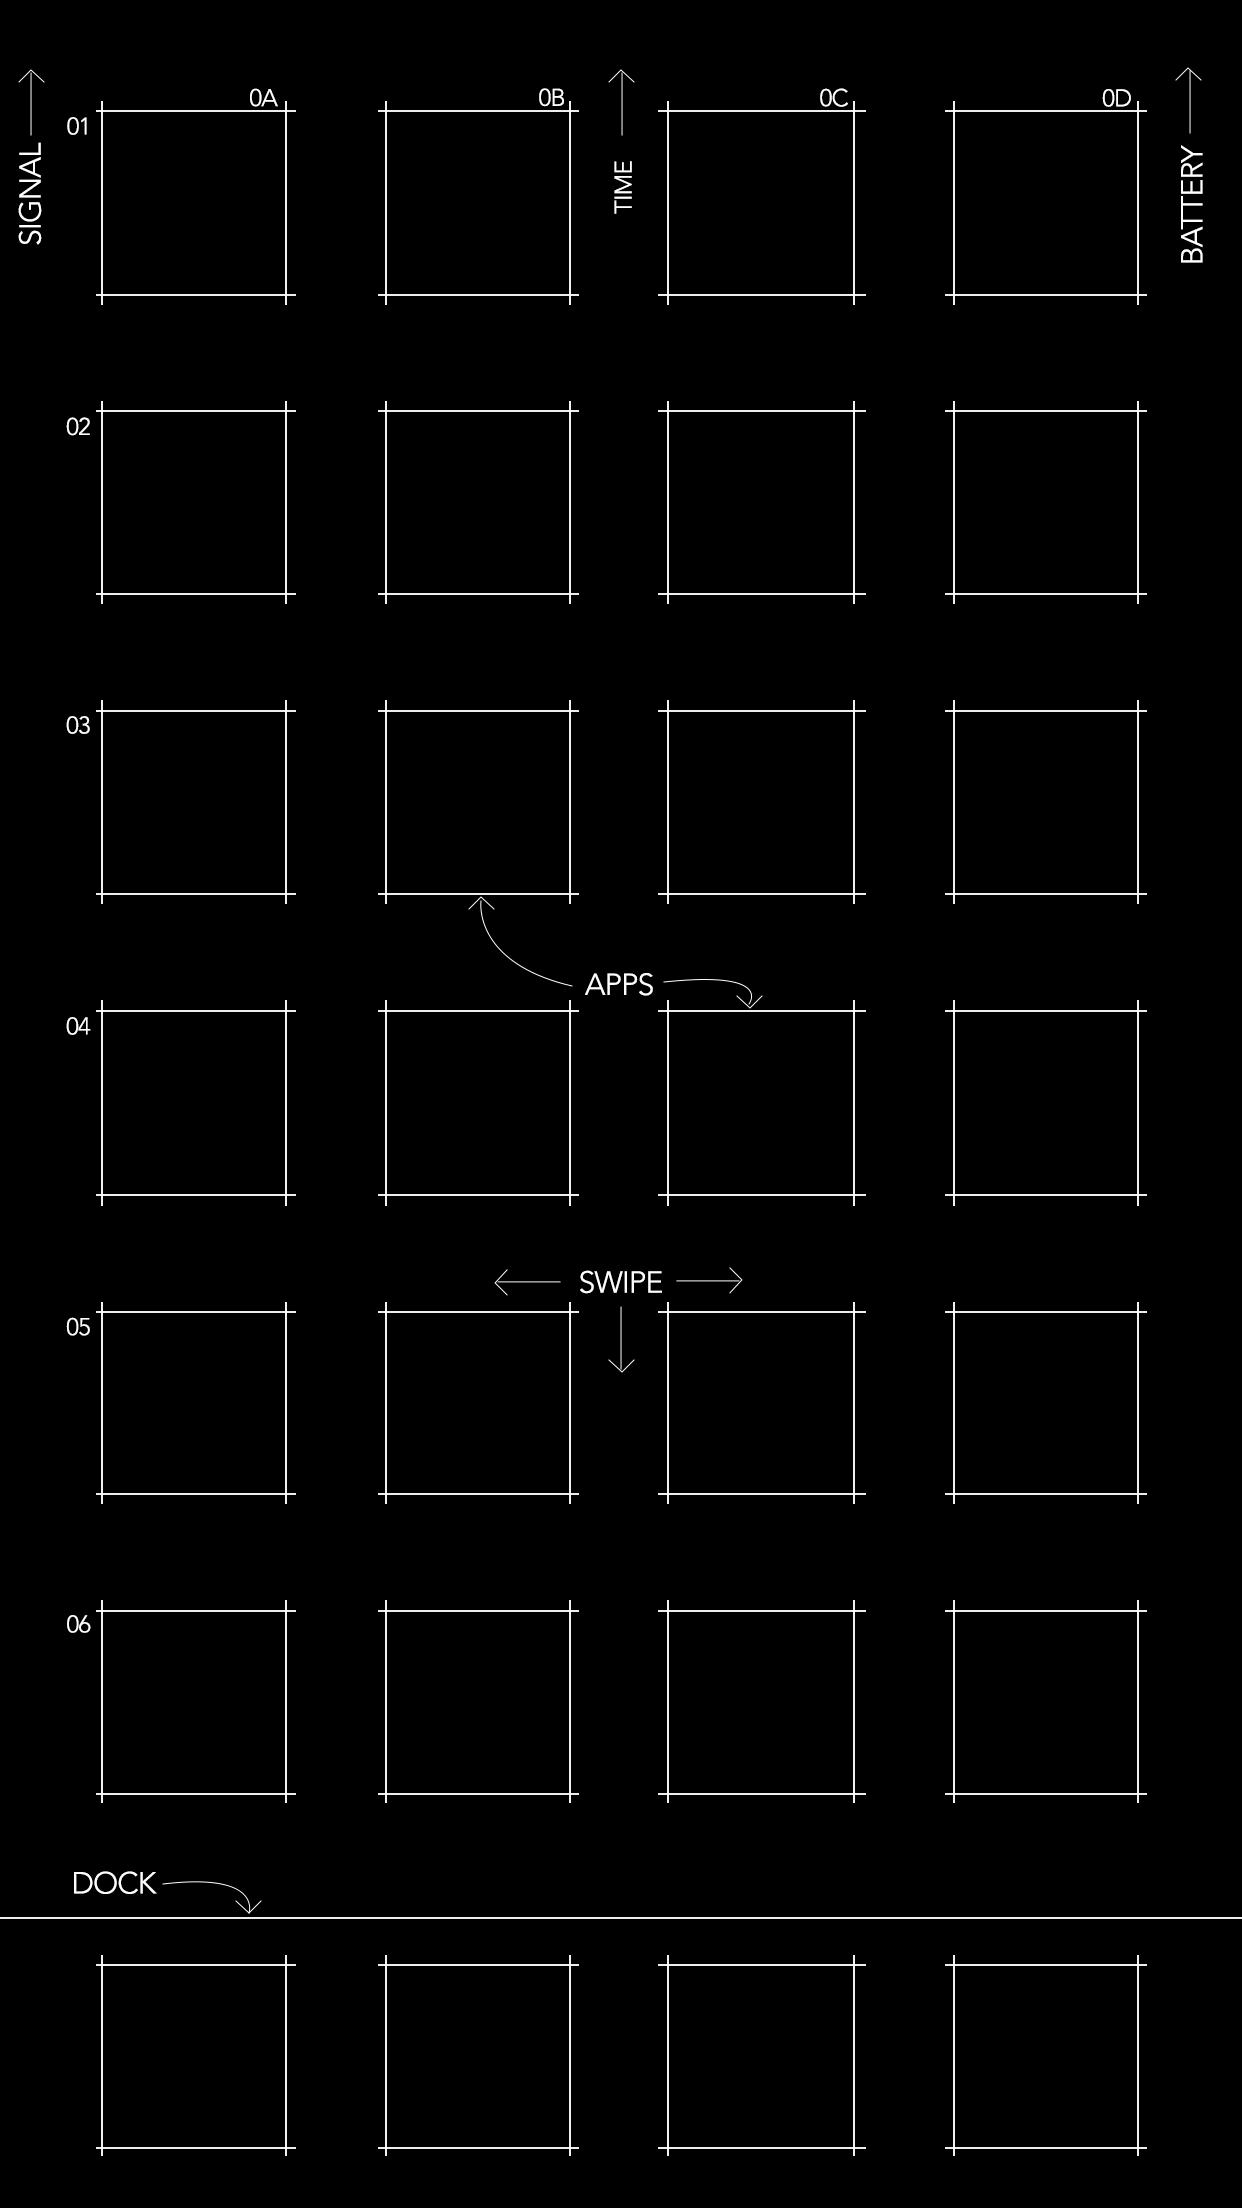 Video games iphone wallpaper tumblr - Best Blueprint Wallpapers For Iphone Iphone 7 Plus And Iphone Se Ios Hacker